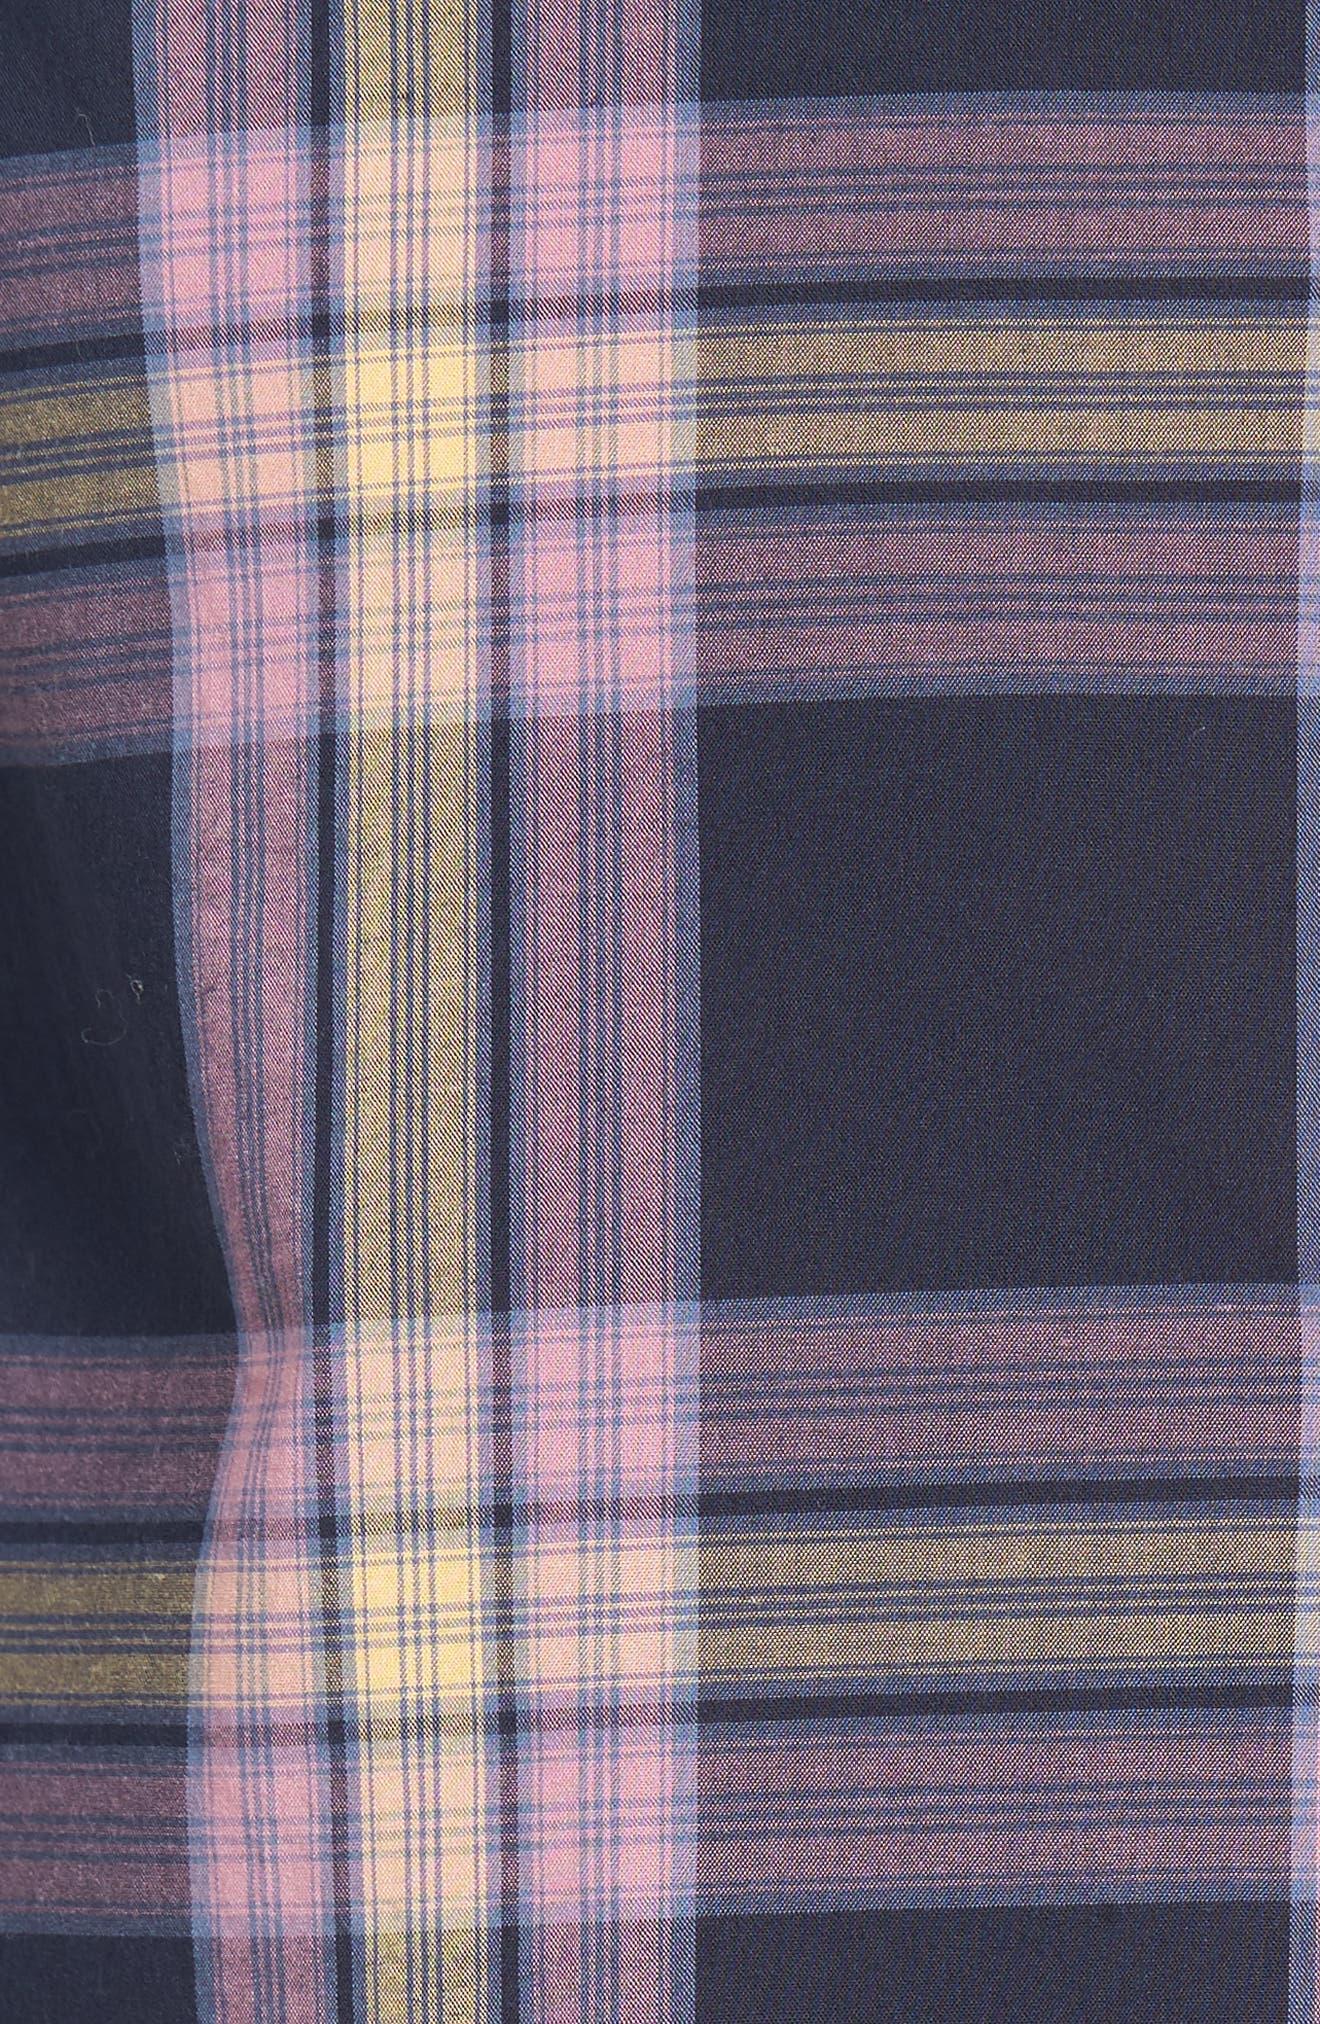 Heritage Slim Fit Plaid Woven Shirt,                             Alternate thumbnail 5, color,                             413